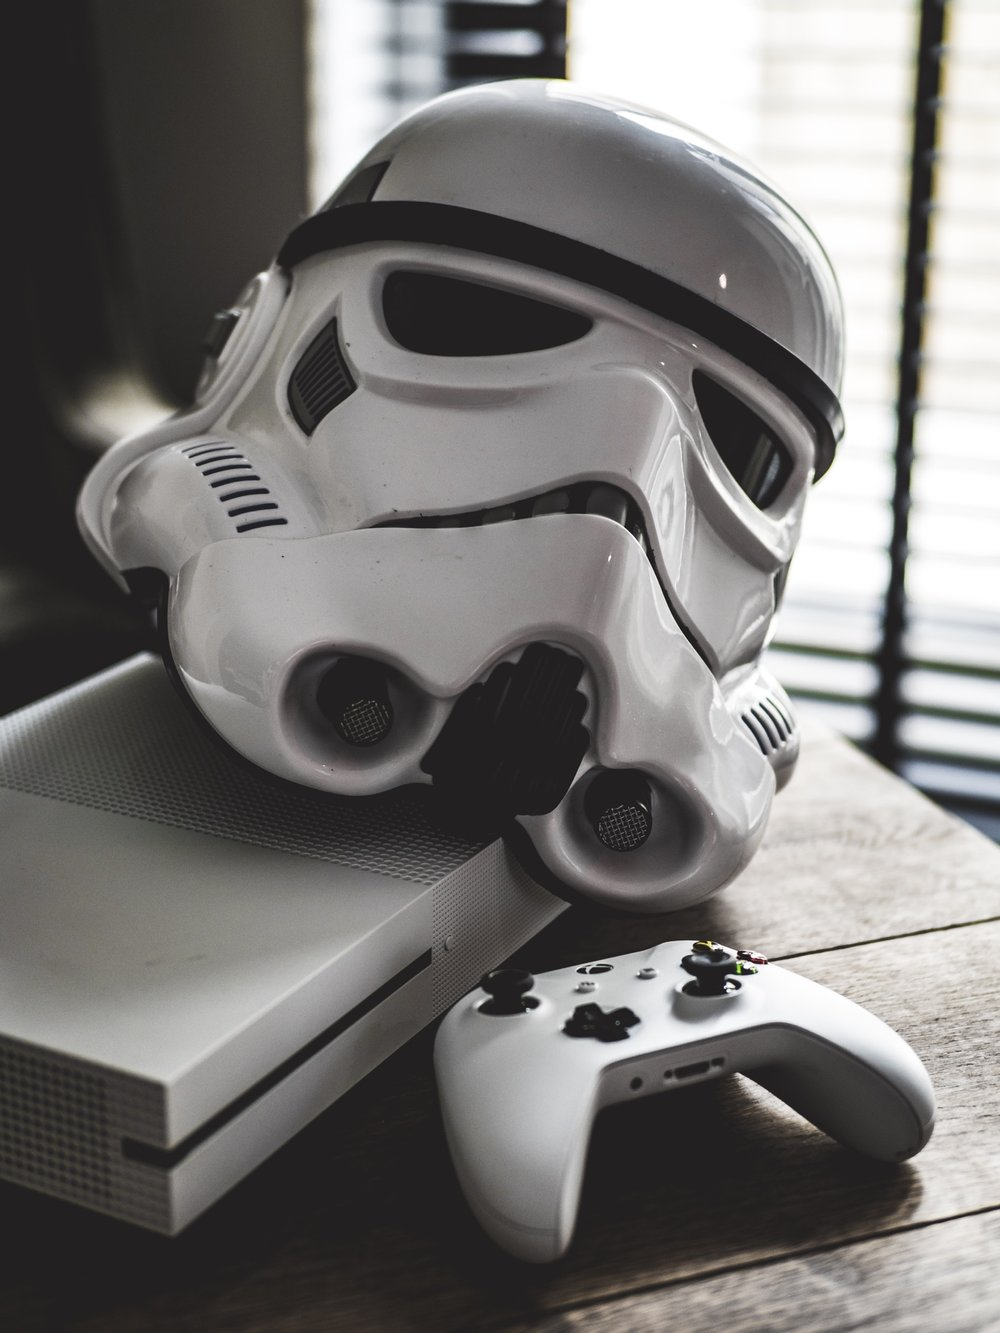 XBOX One S Star Wars Battlefront II 2 Stormtrooper Helmet Hasbro Black Edition